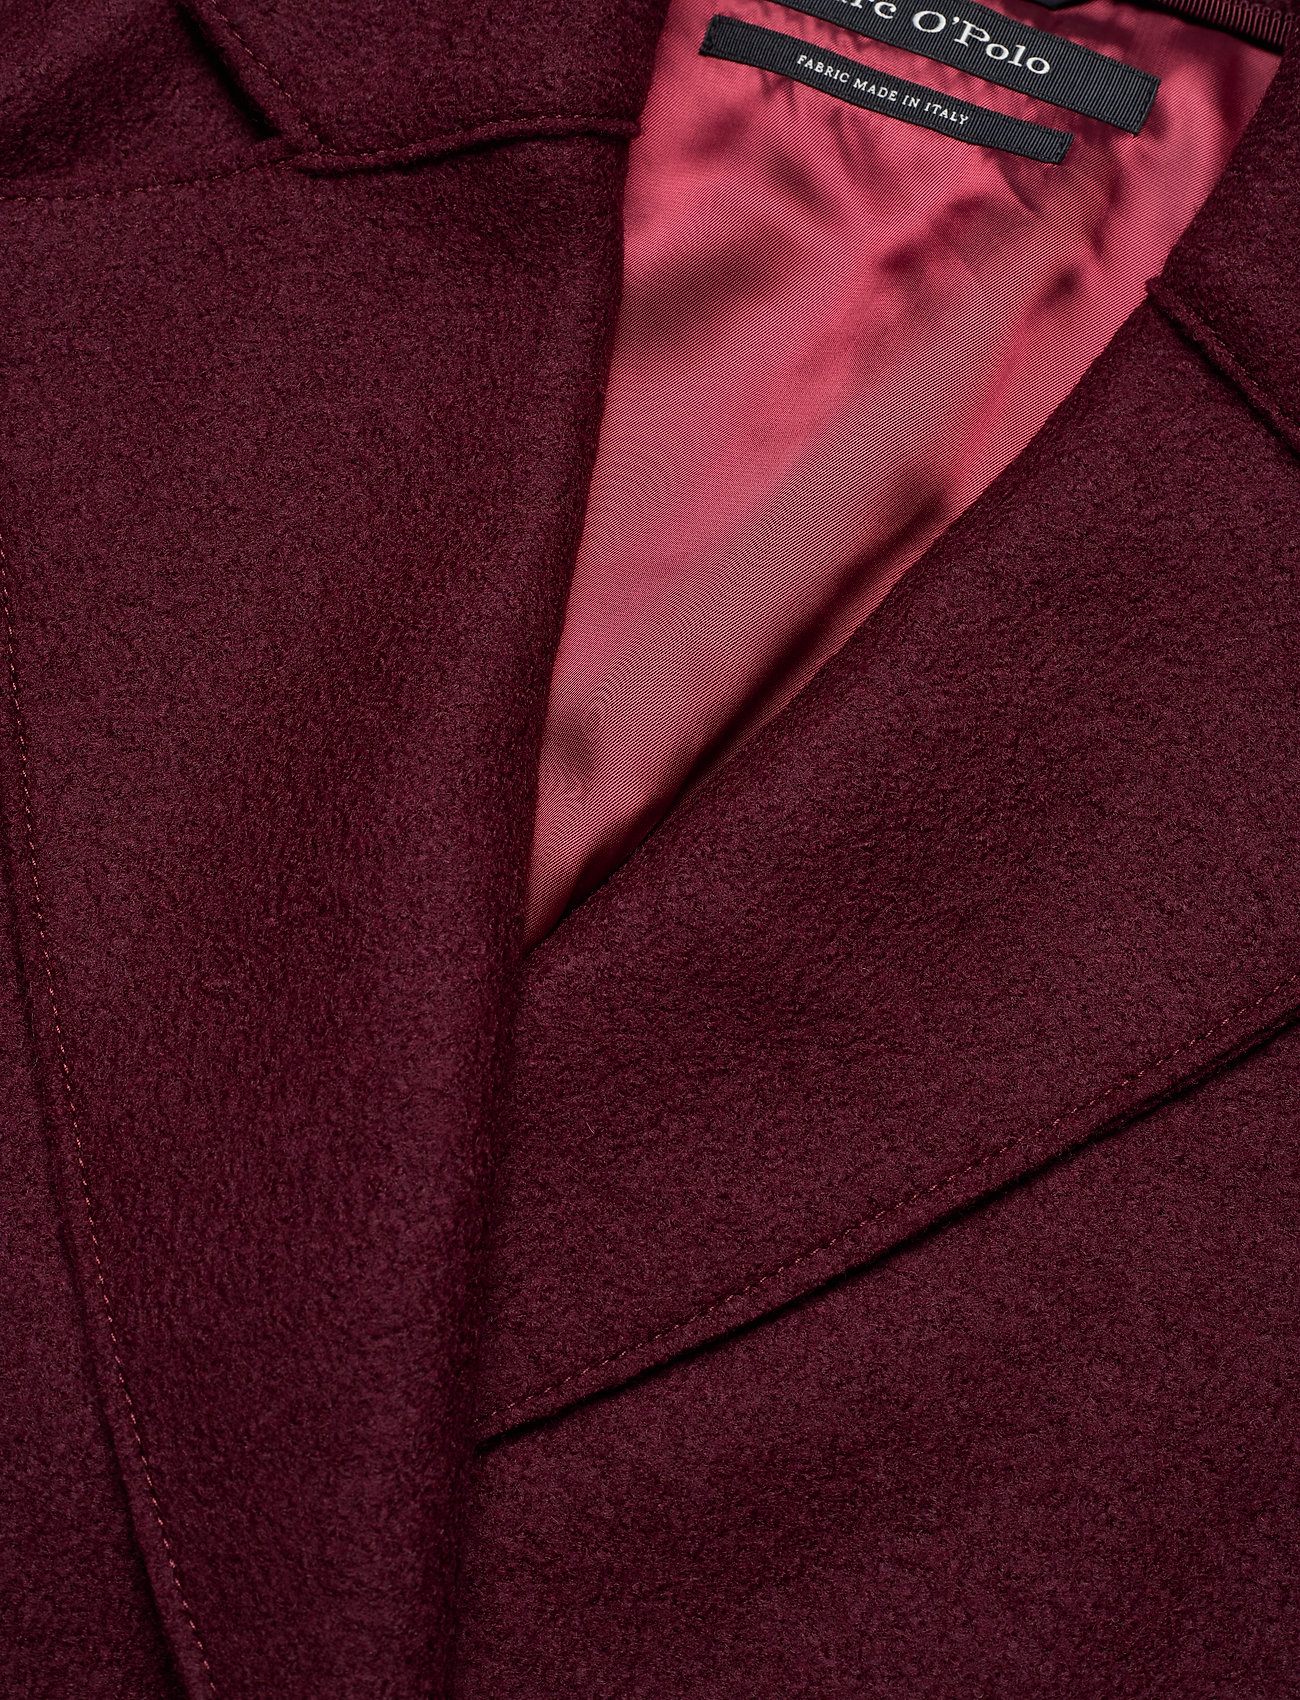 Heavy Knit Outdoor (Deep Merlot) (2489.40 kr) - Marc O'Polo